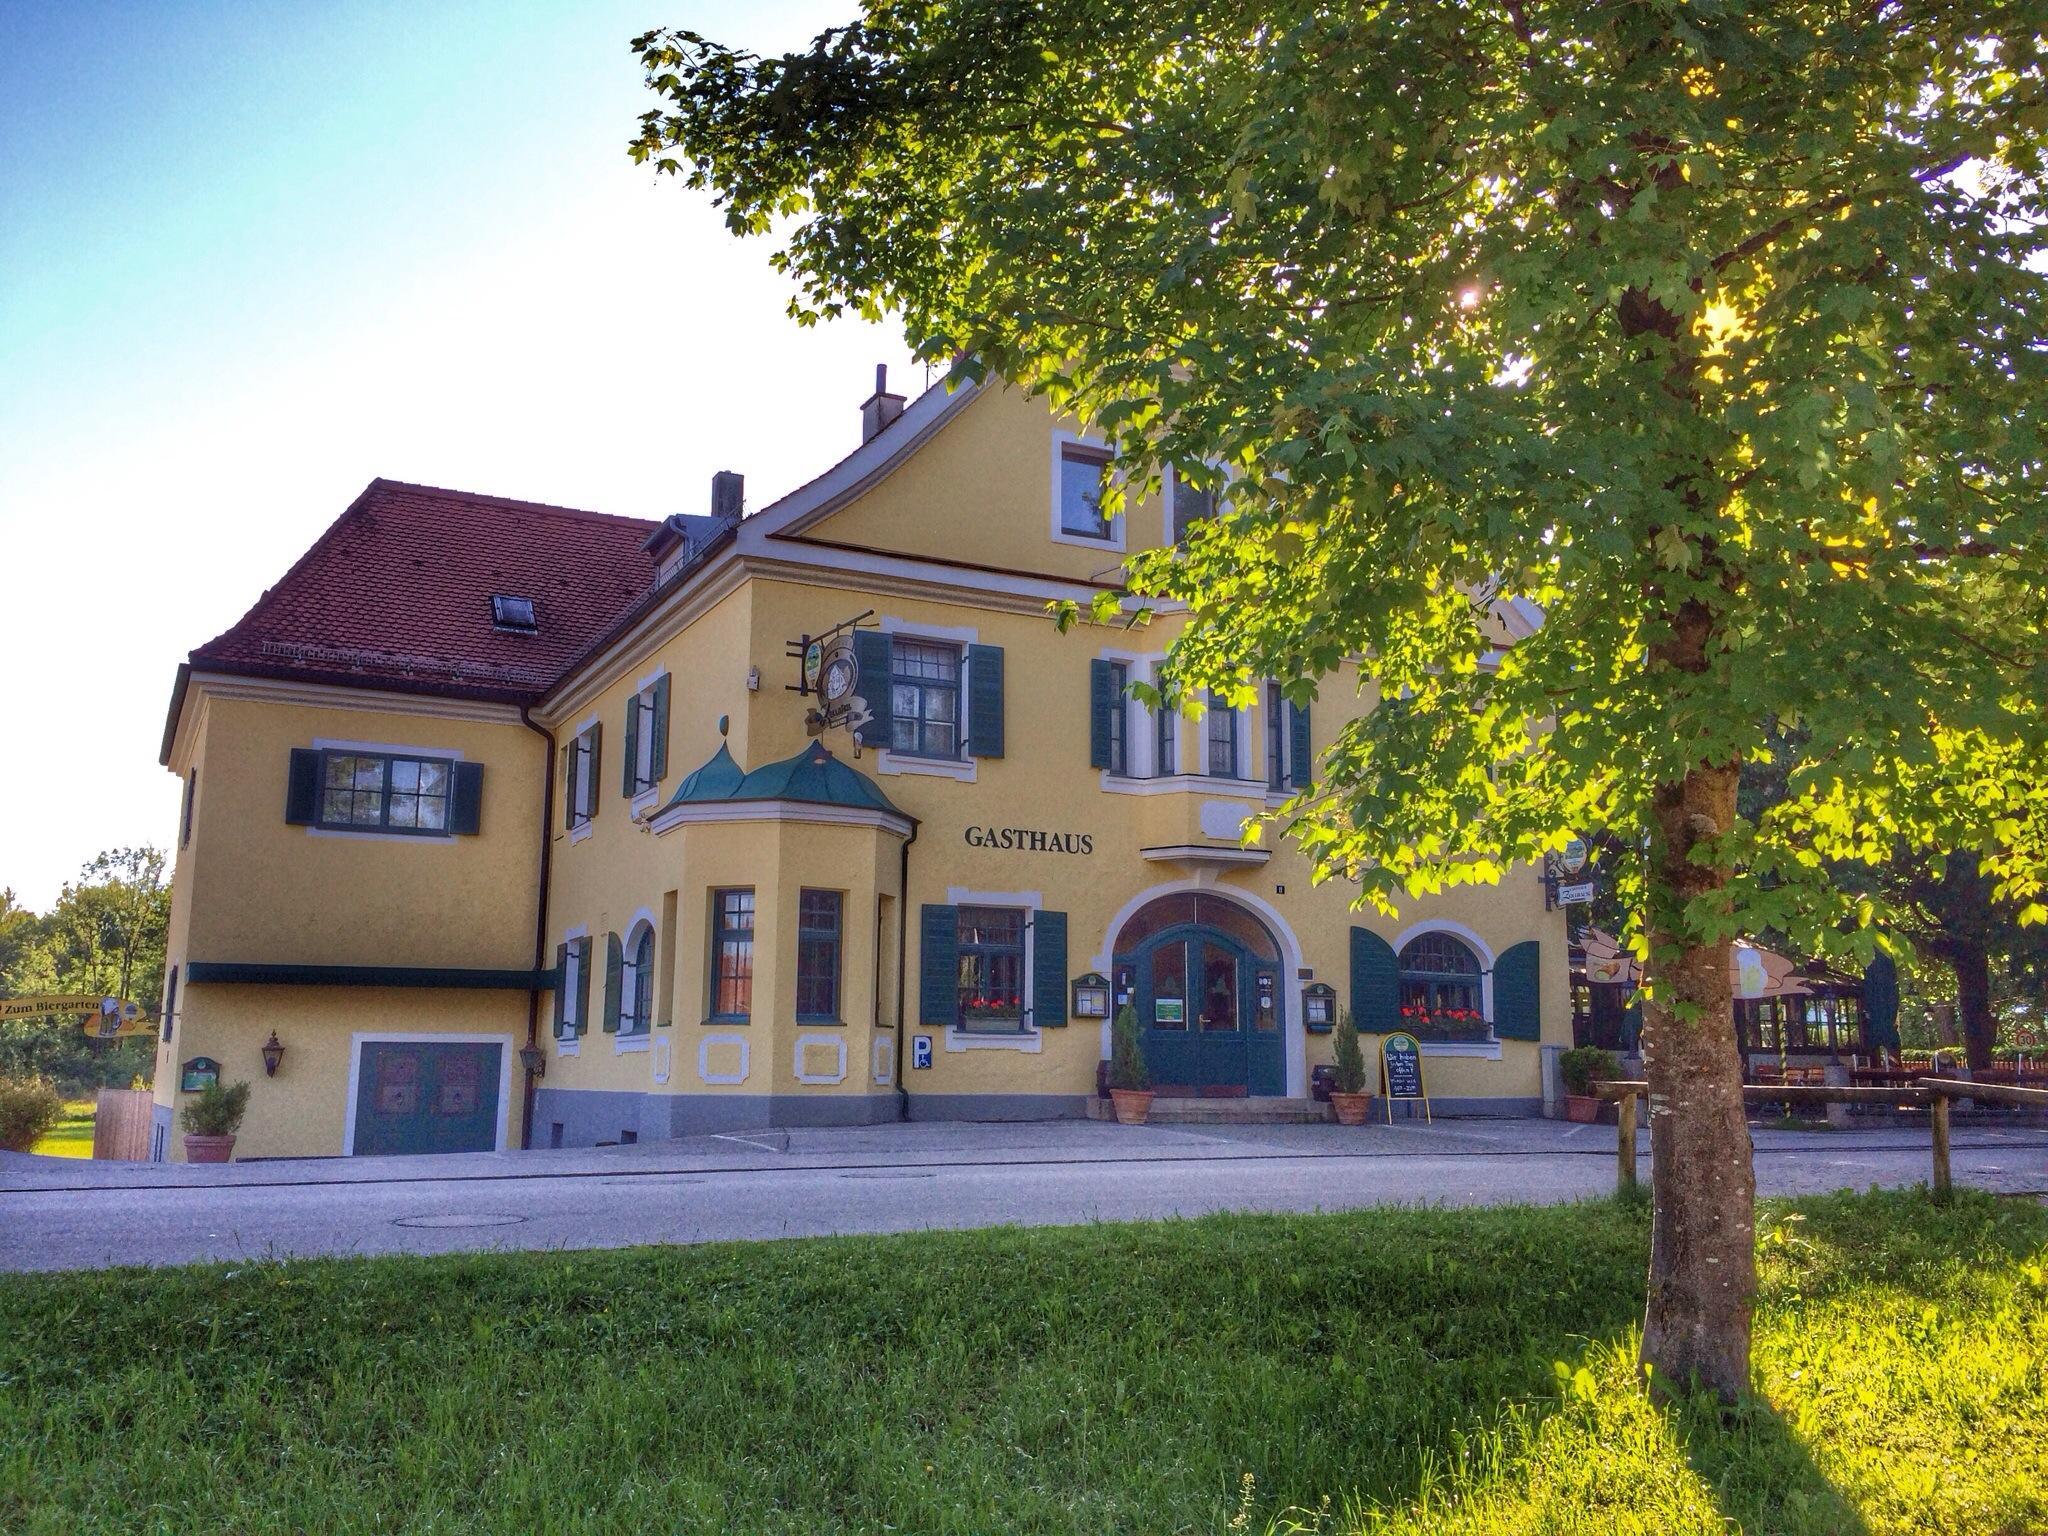 Gasthaus Zollhausl